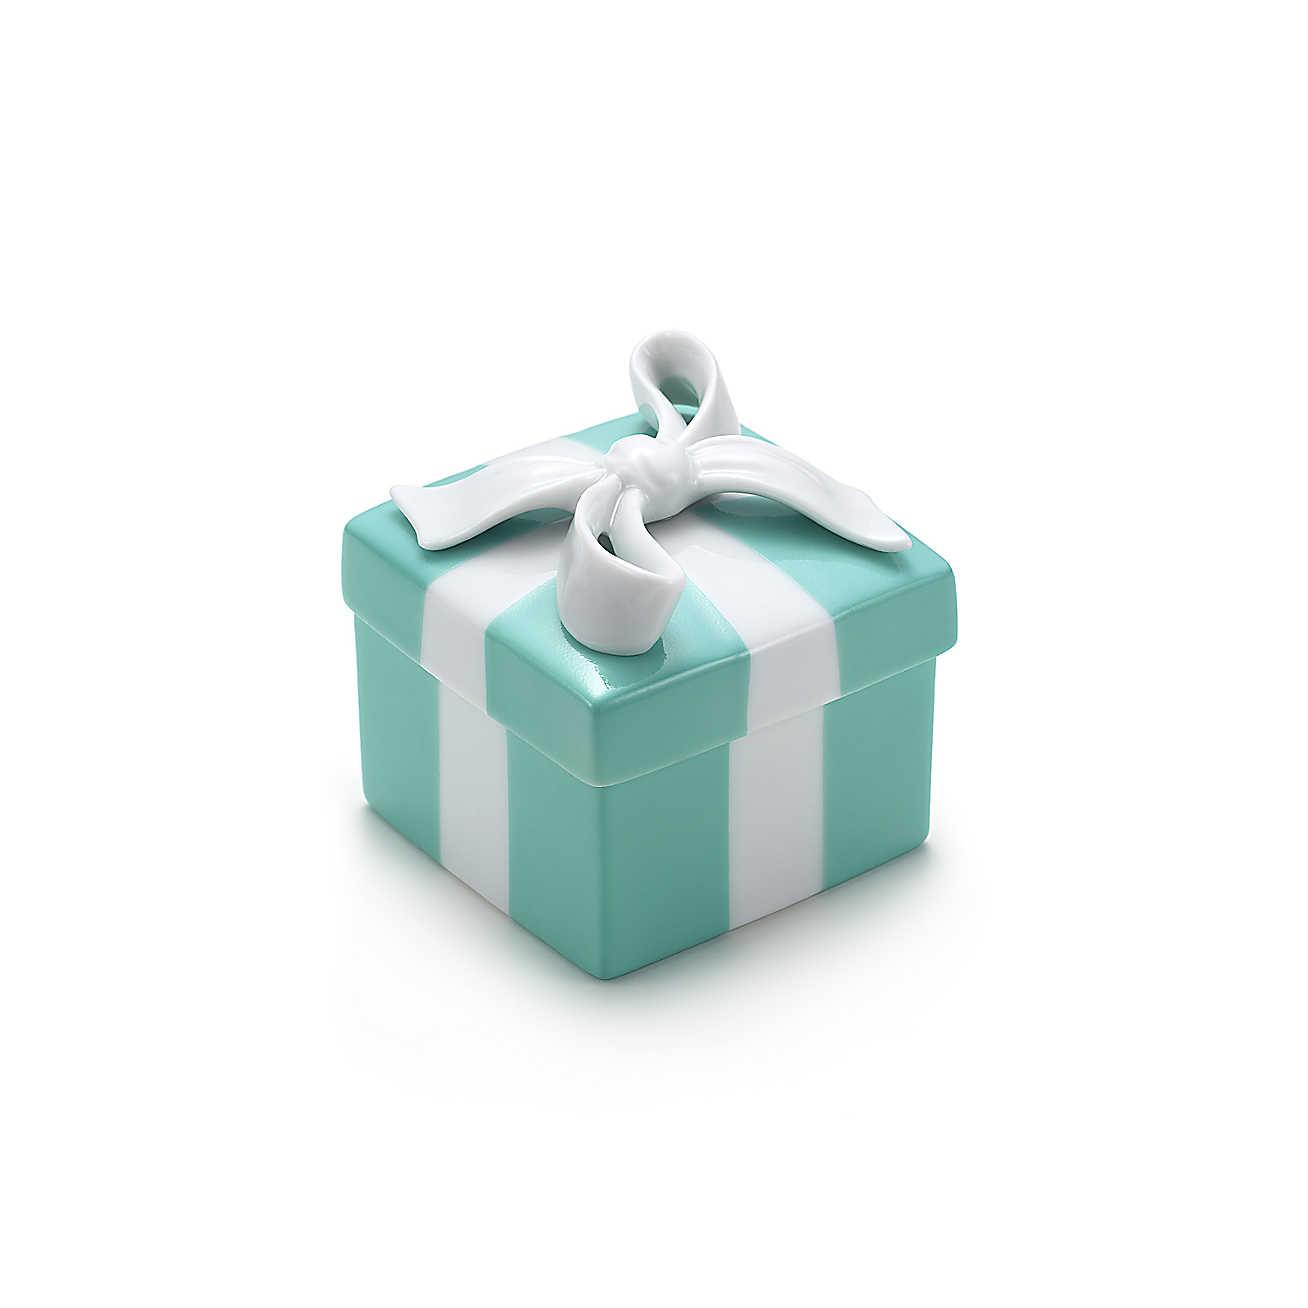 Free Tiffany\'s Box Cliparts, Download Free Clip Art, Free.